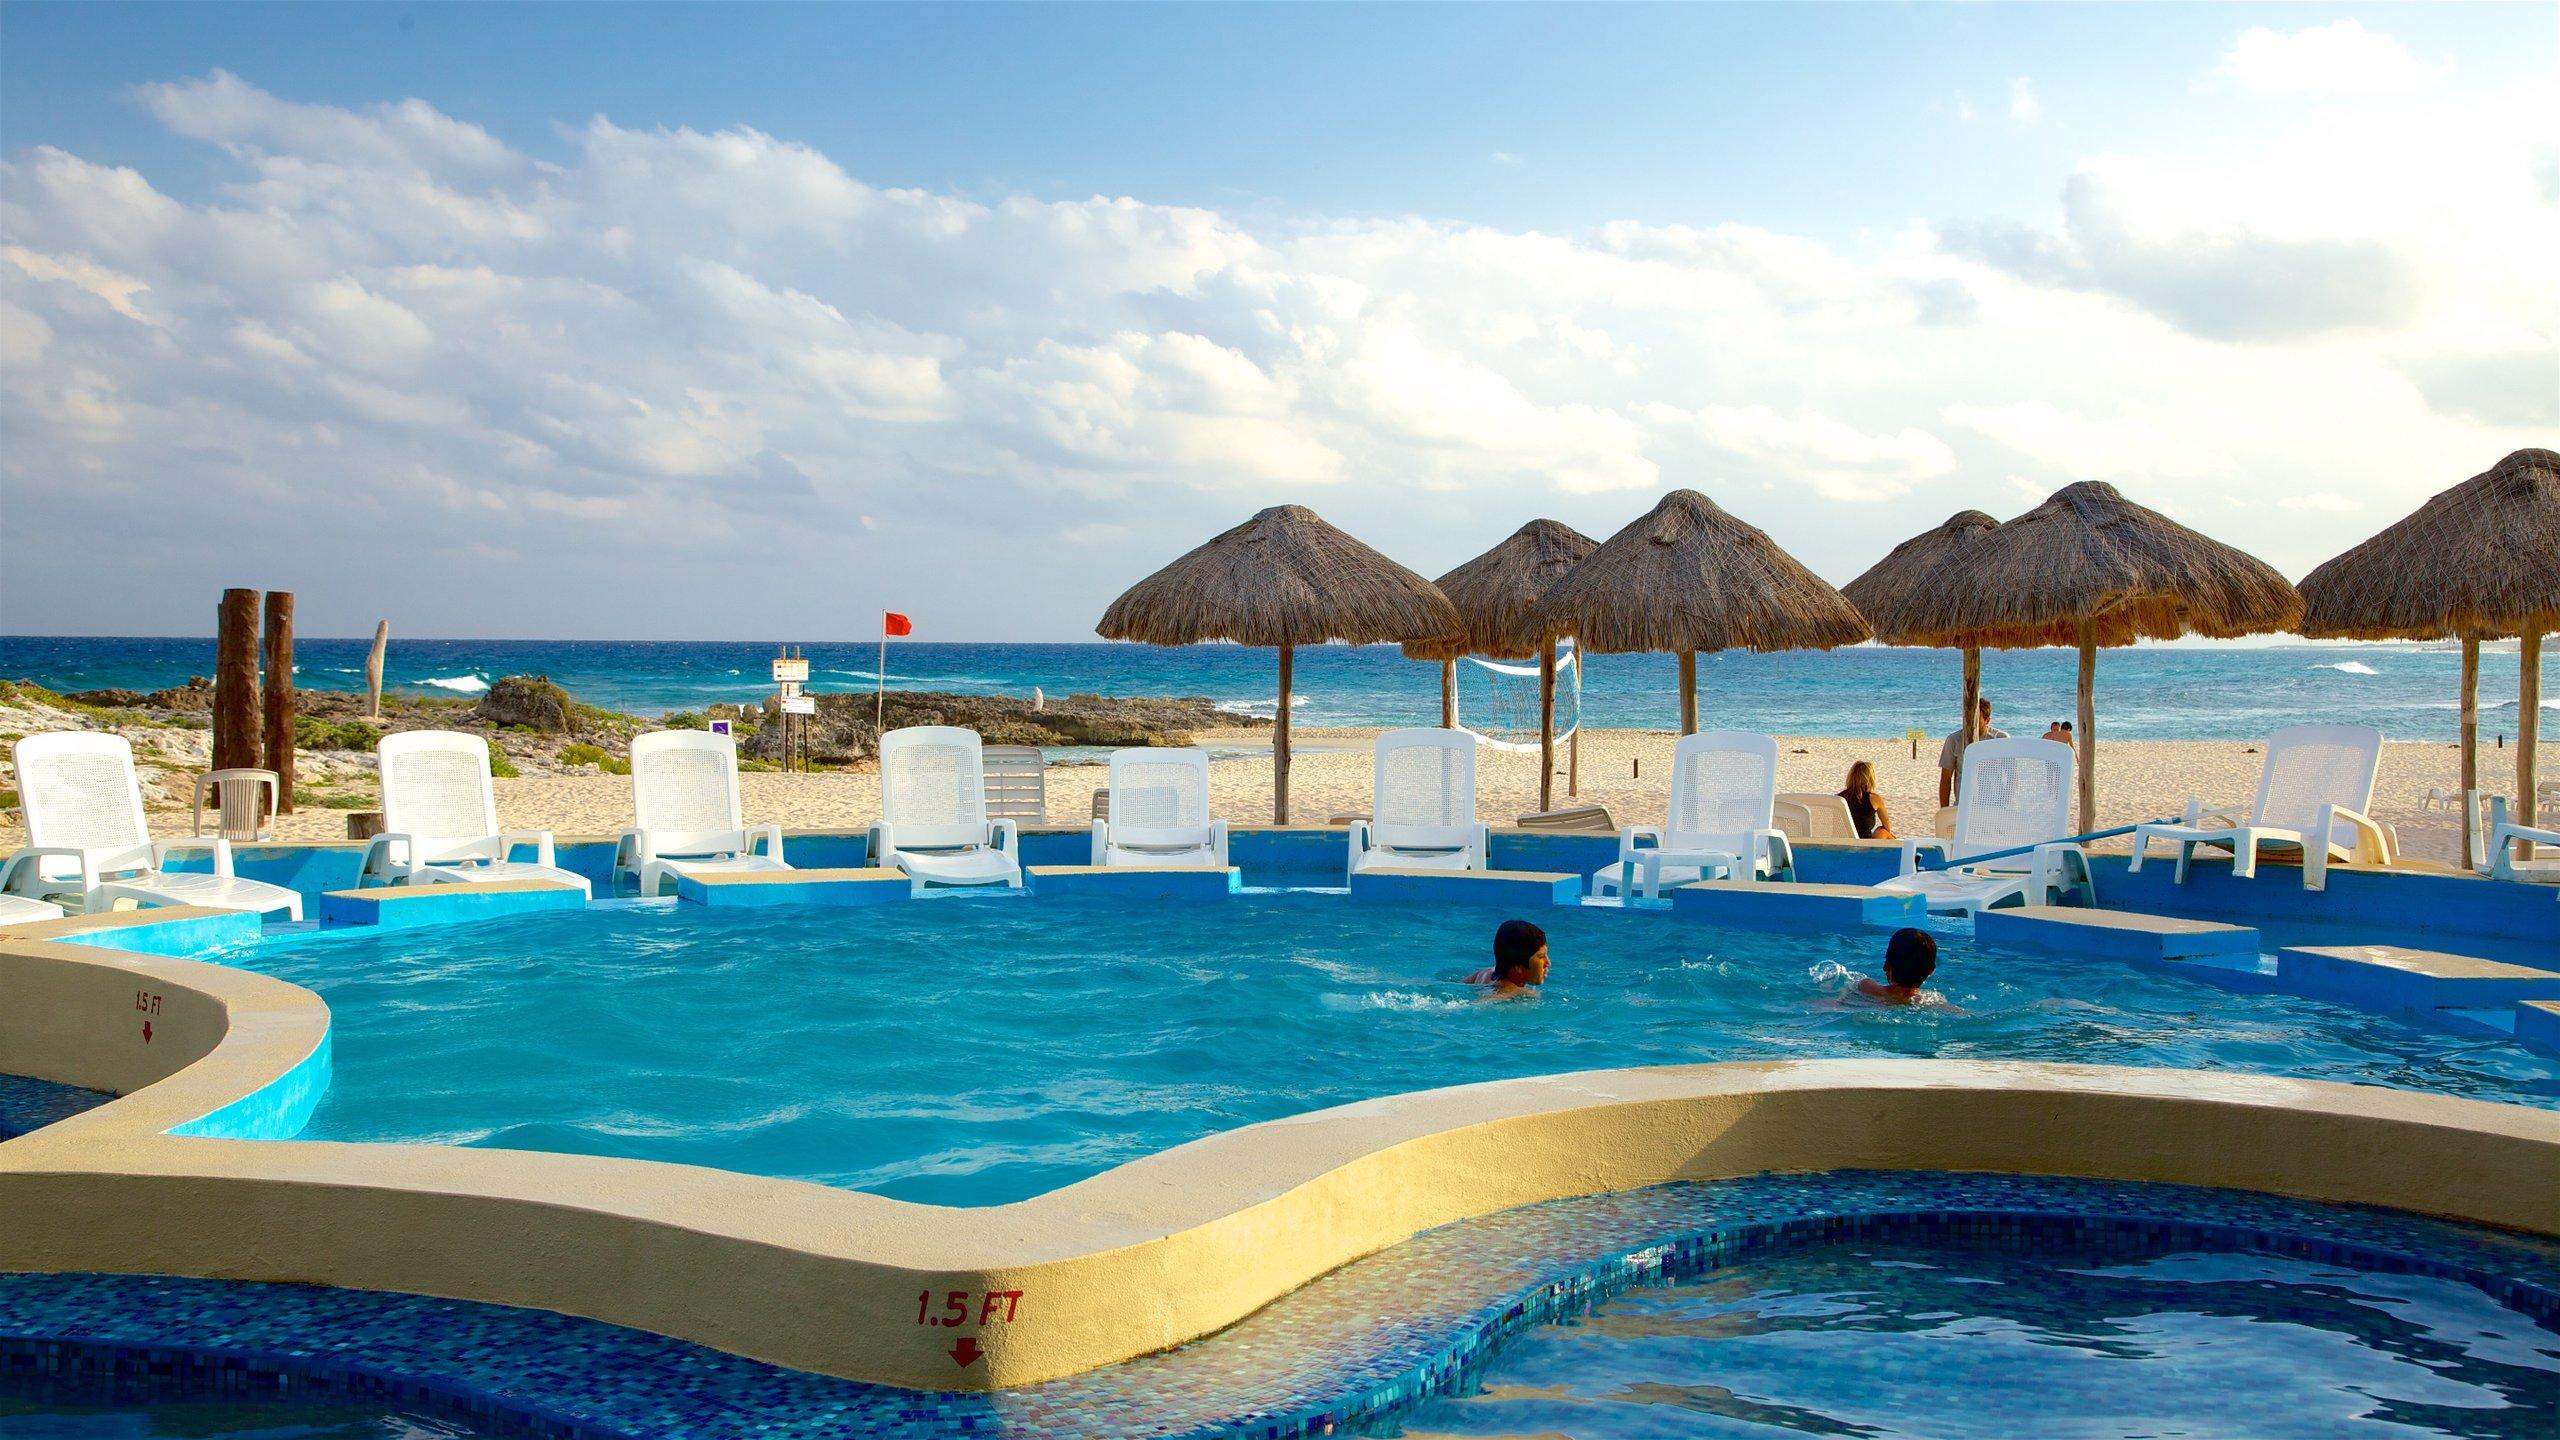 San Miguel, Cozumel, Quintana Roo, Mexico